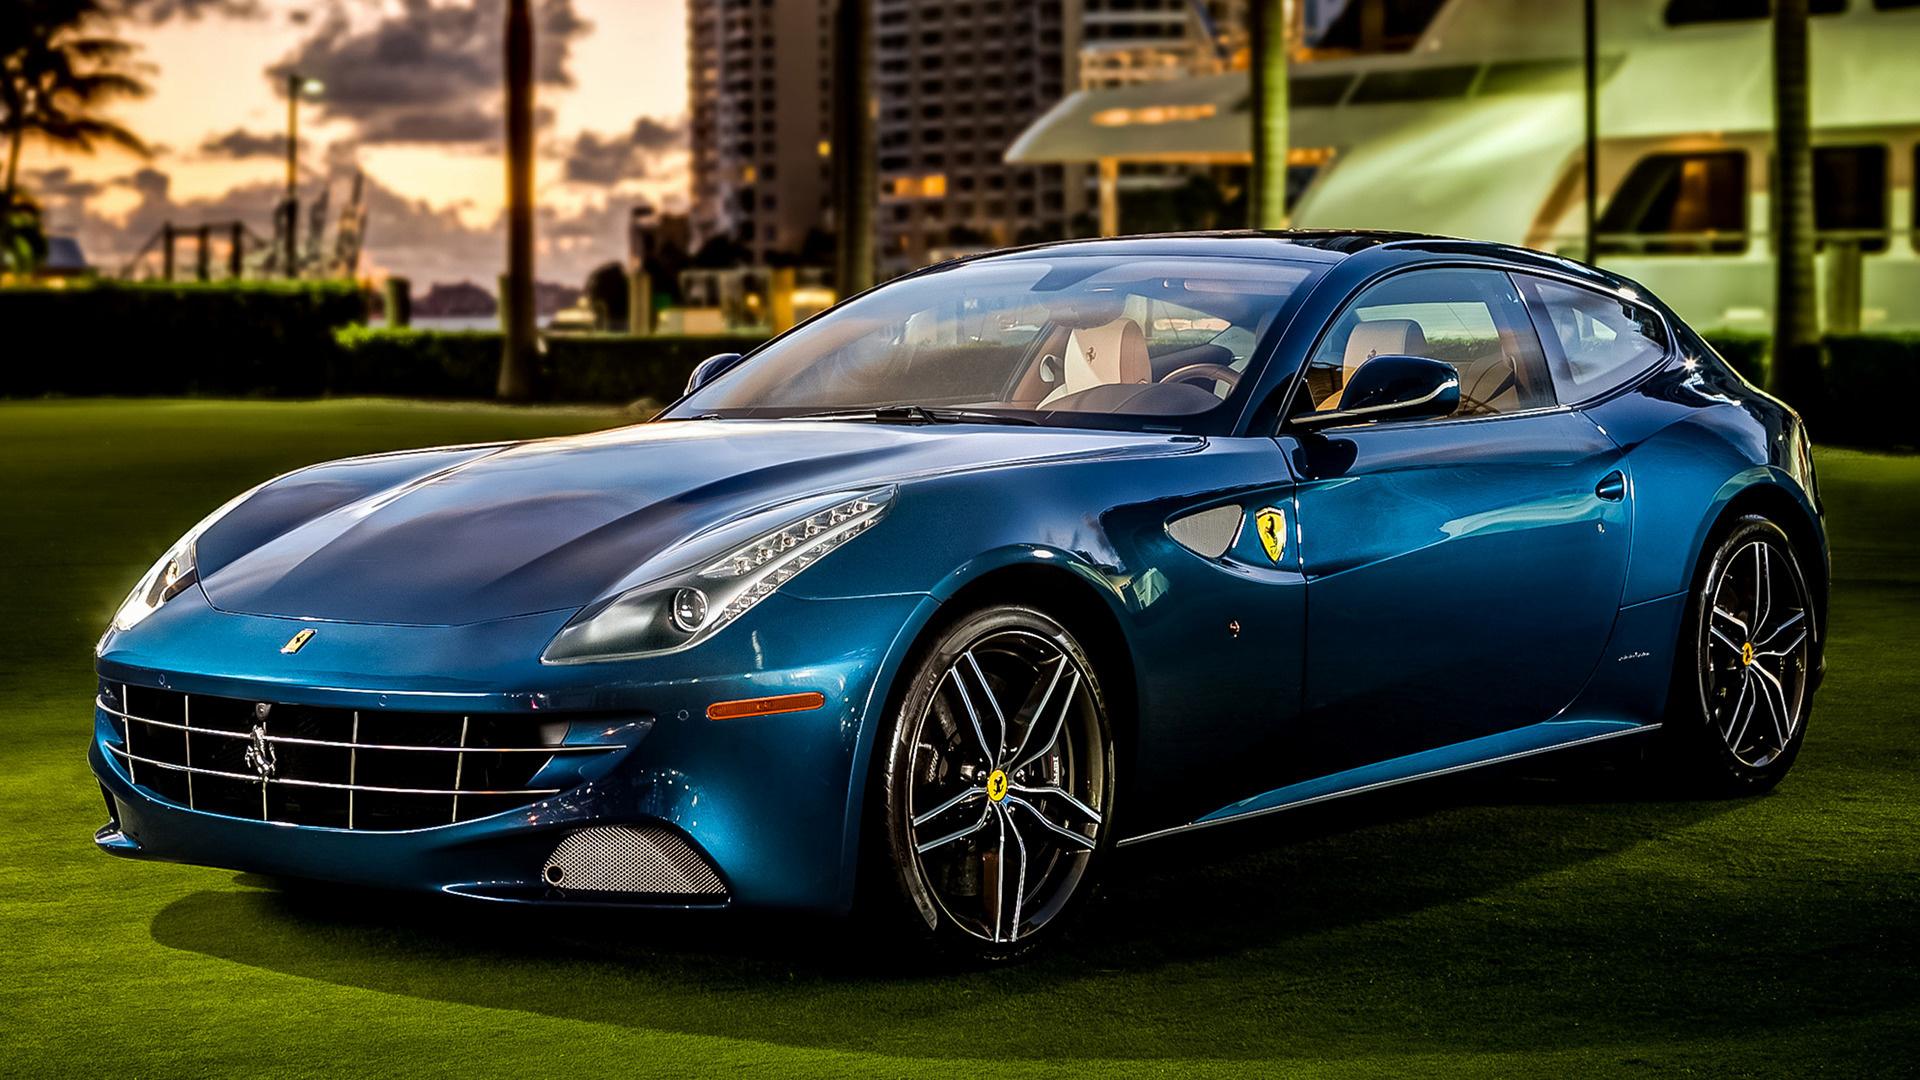 2011 Ferrari Ff Us Hintergrundbilder Und Wallpaper In Hd Car Pixel